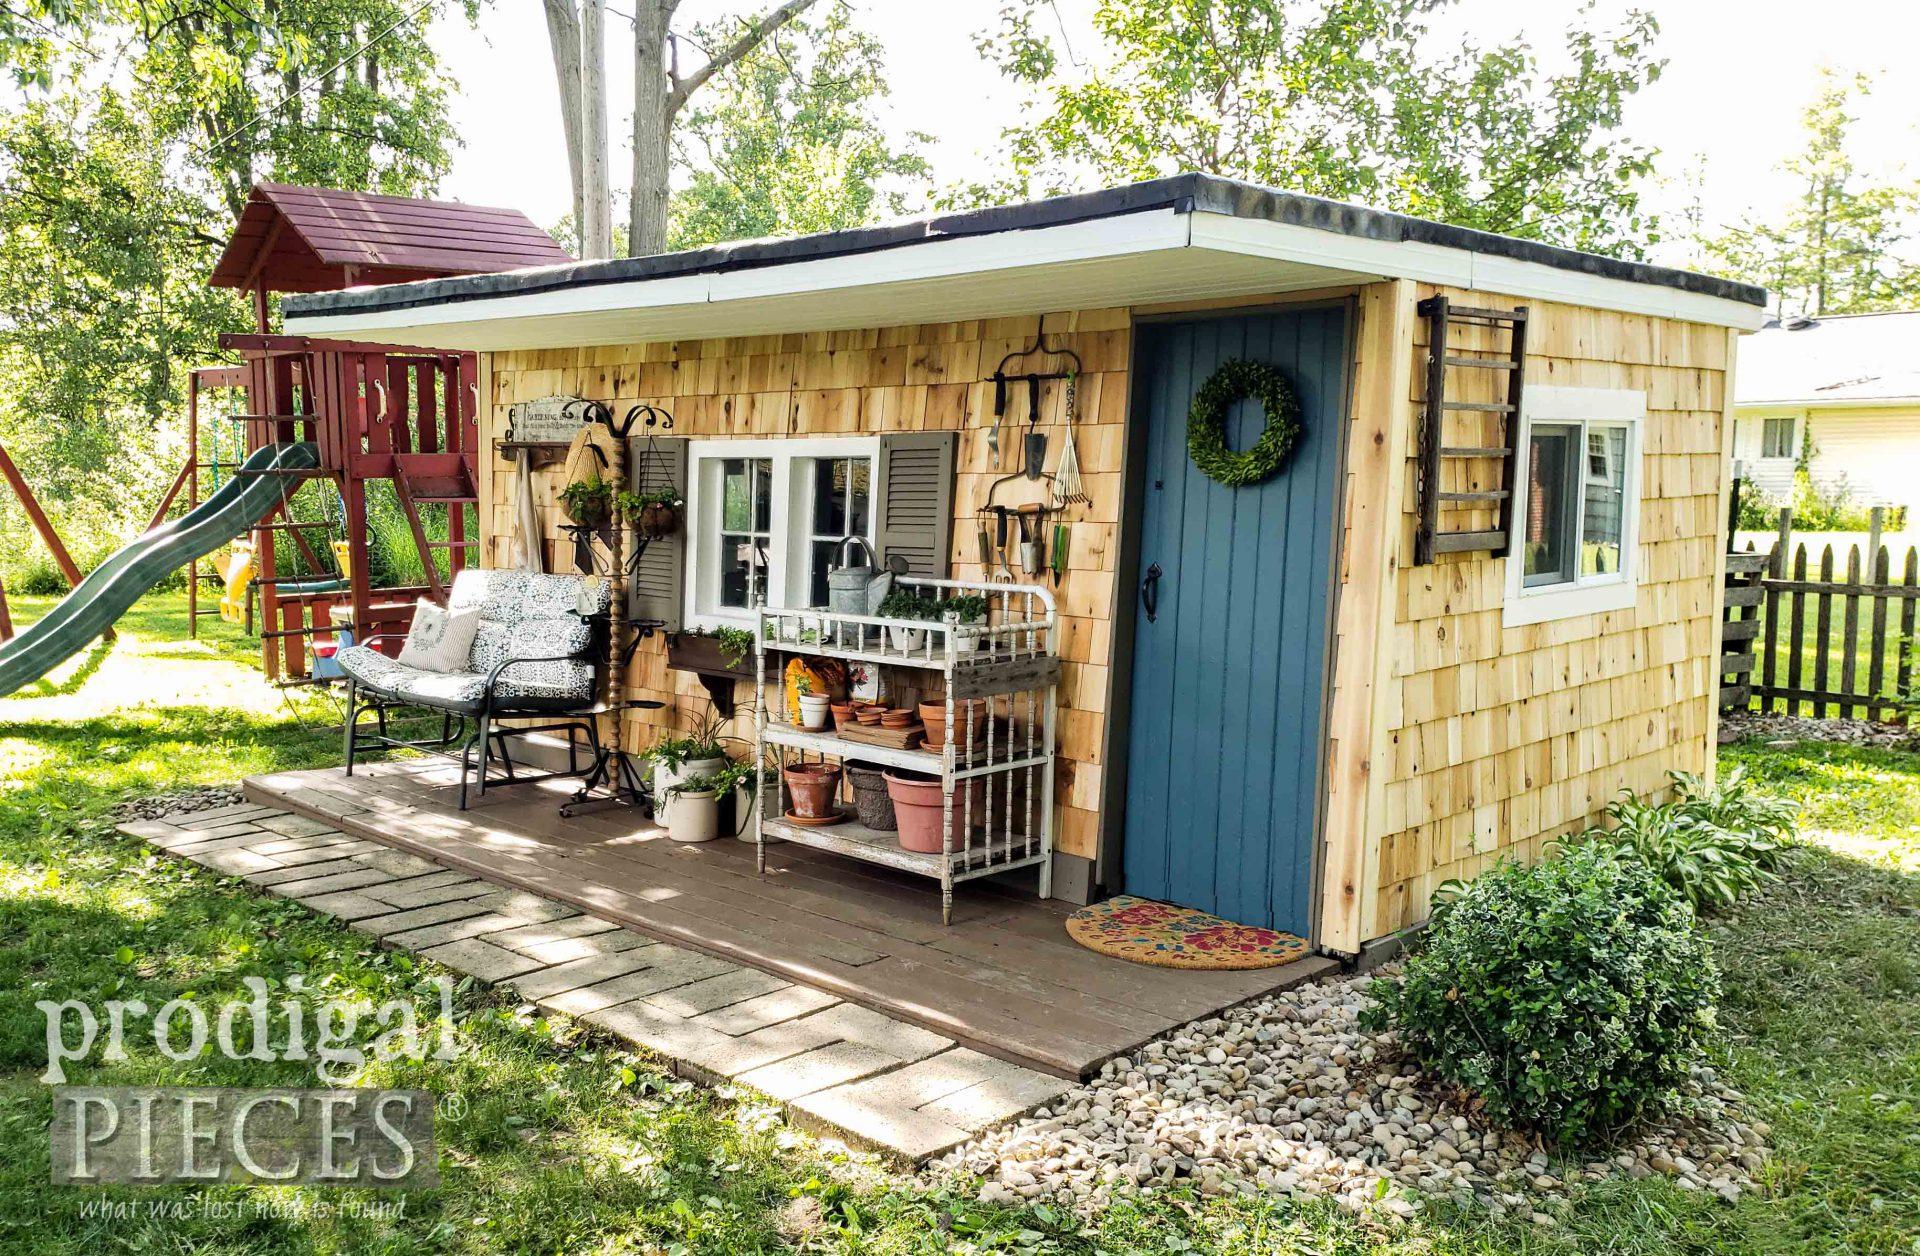 Backyard Garden Shed with Cedar Shake Siding by Prodigal Pieces | prodigalpieces.com #prodigalpieces #diy #garden